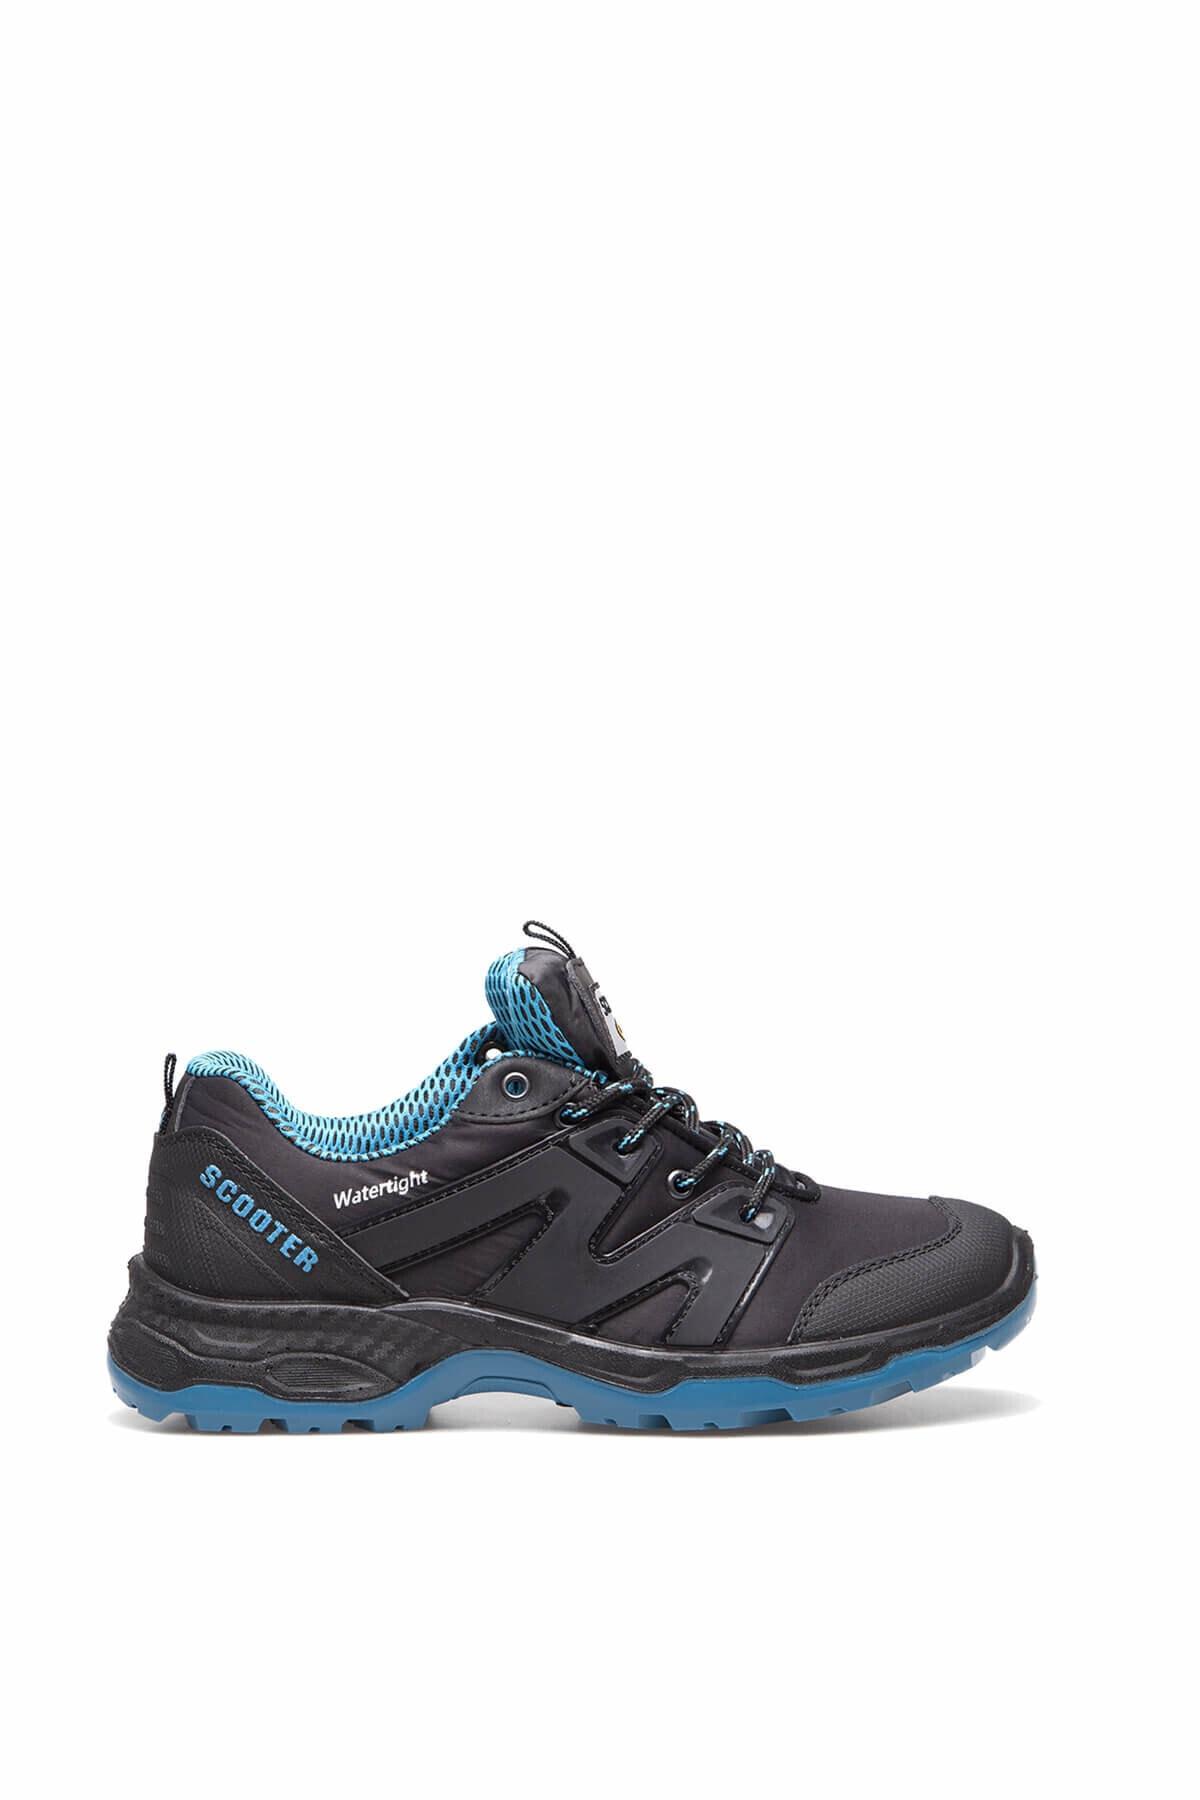 Scooter Su Geçirmez Kadın Siyah-Mavi Sneaker - 3W92G5222T 1